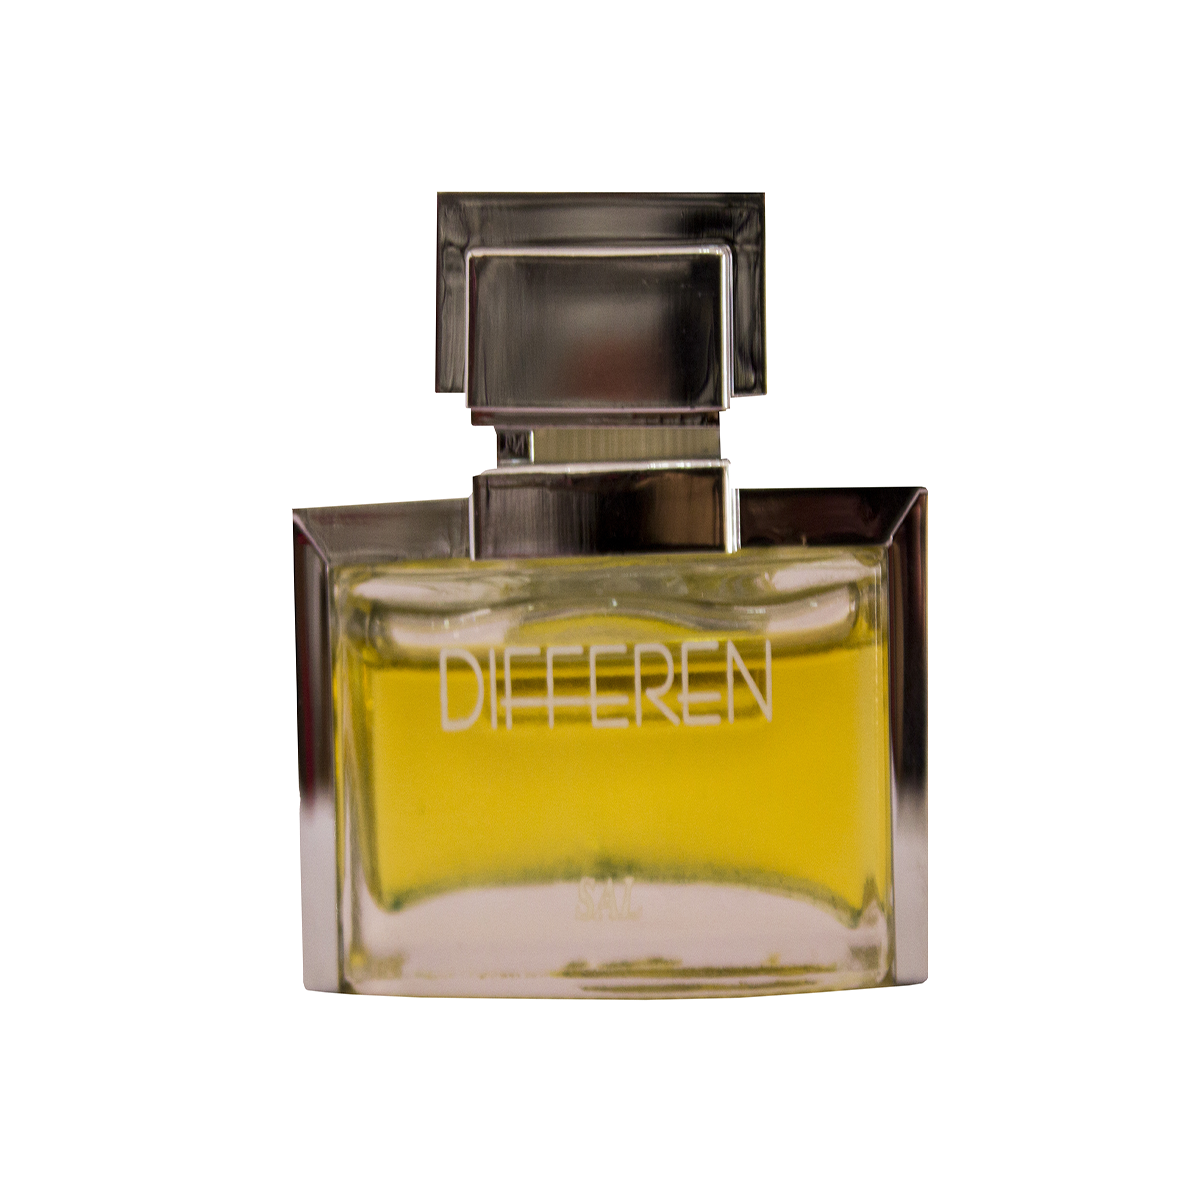 Perfume (Dashboard )